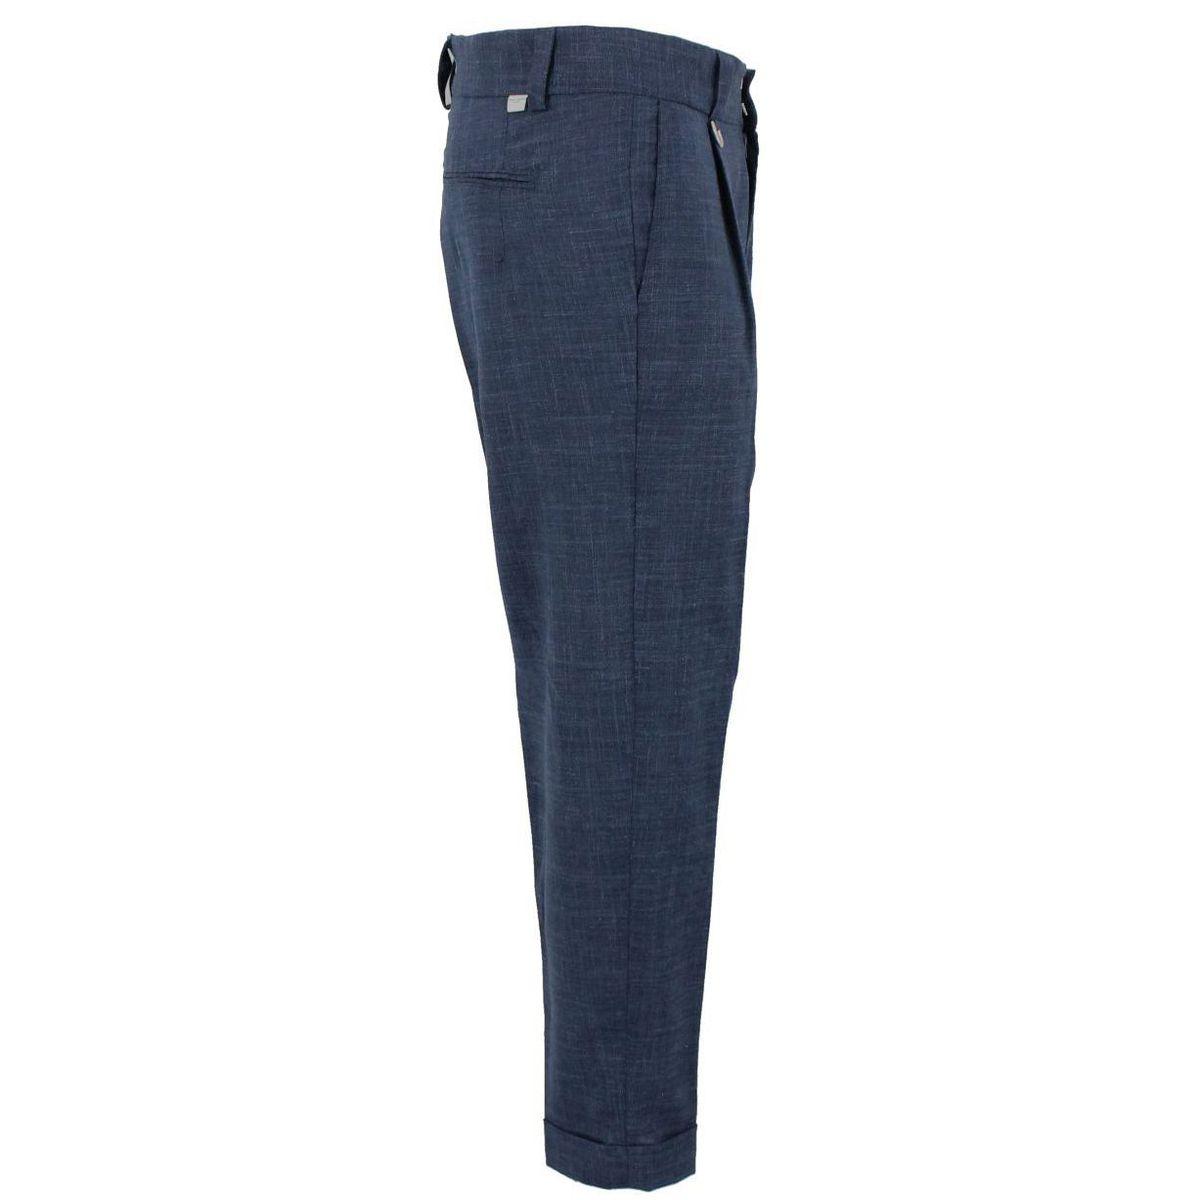 Pantalone chino tela misto lino Blue Paolo Pecora Milano